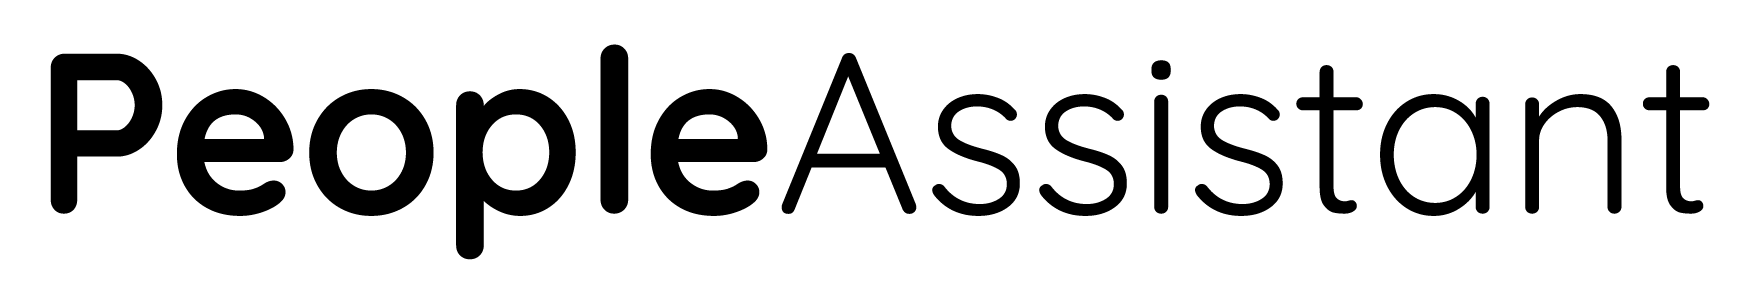 PeopleAssistant_logo